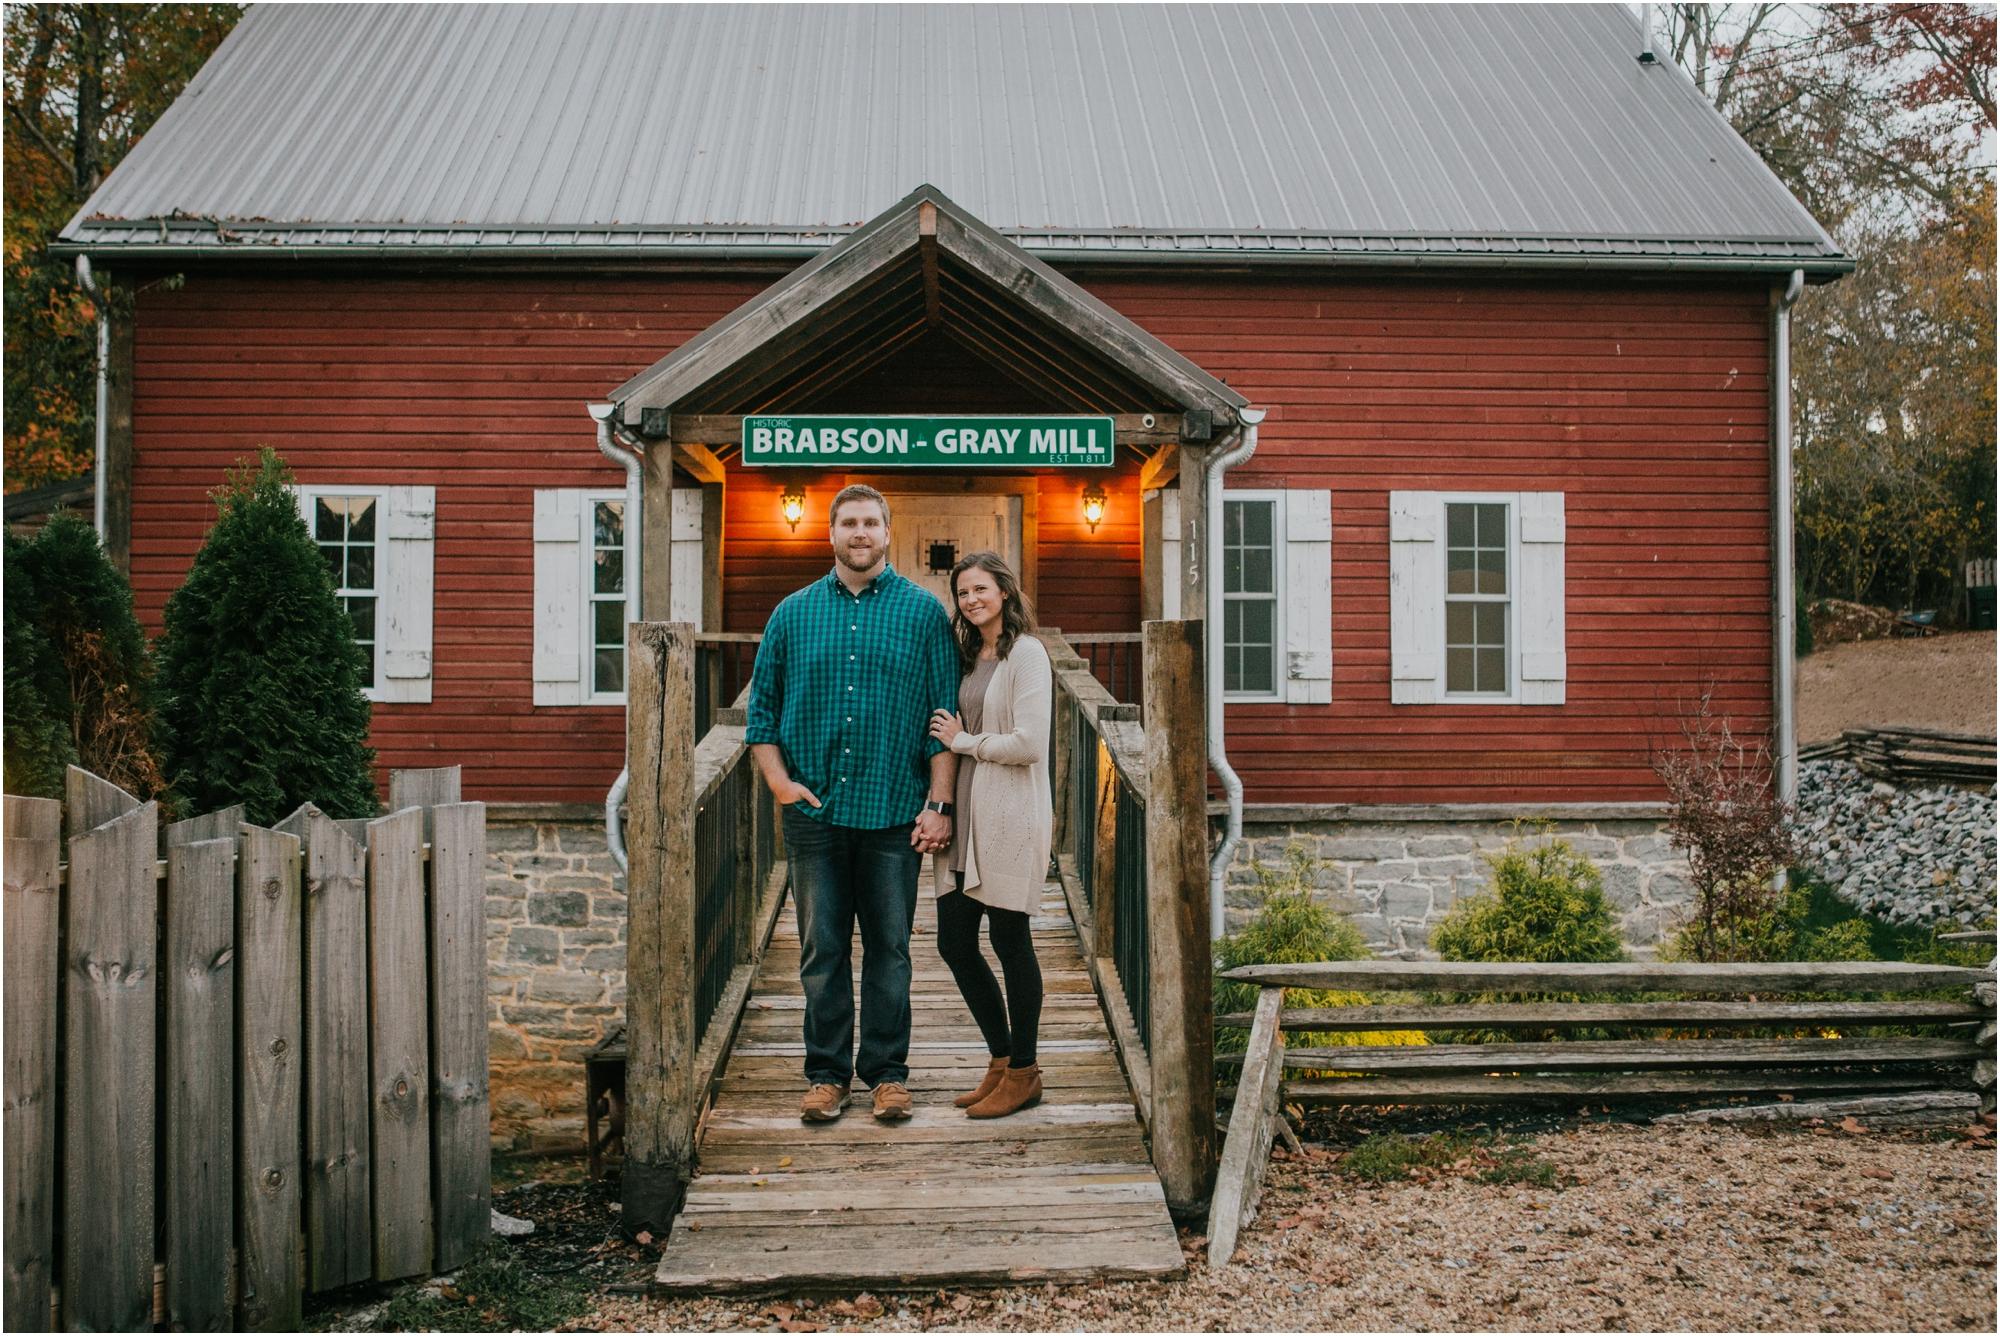 katy-sergent-millstone-limestone-tn-rustic-fall-engagement-session-adventurous-outdoors-intimate-elopement-wedding-northeast-johnson-city-photographer_0035.jpg